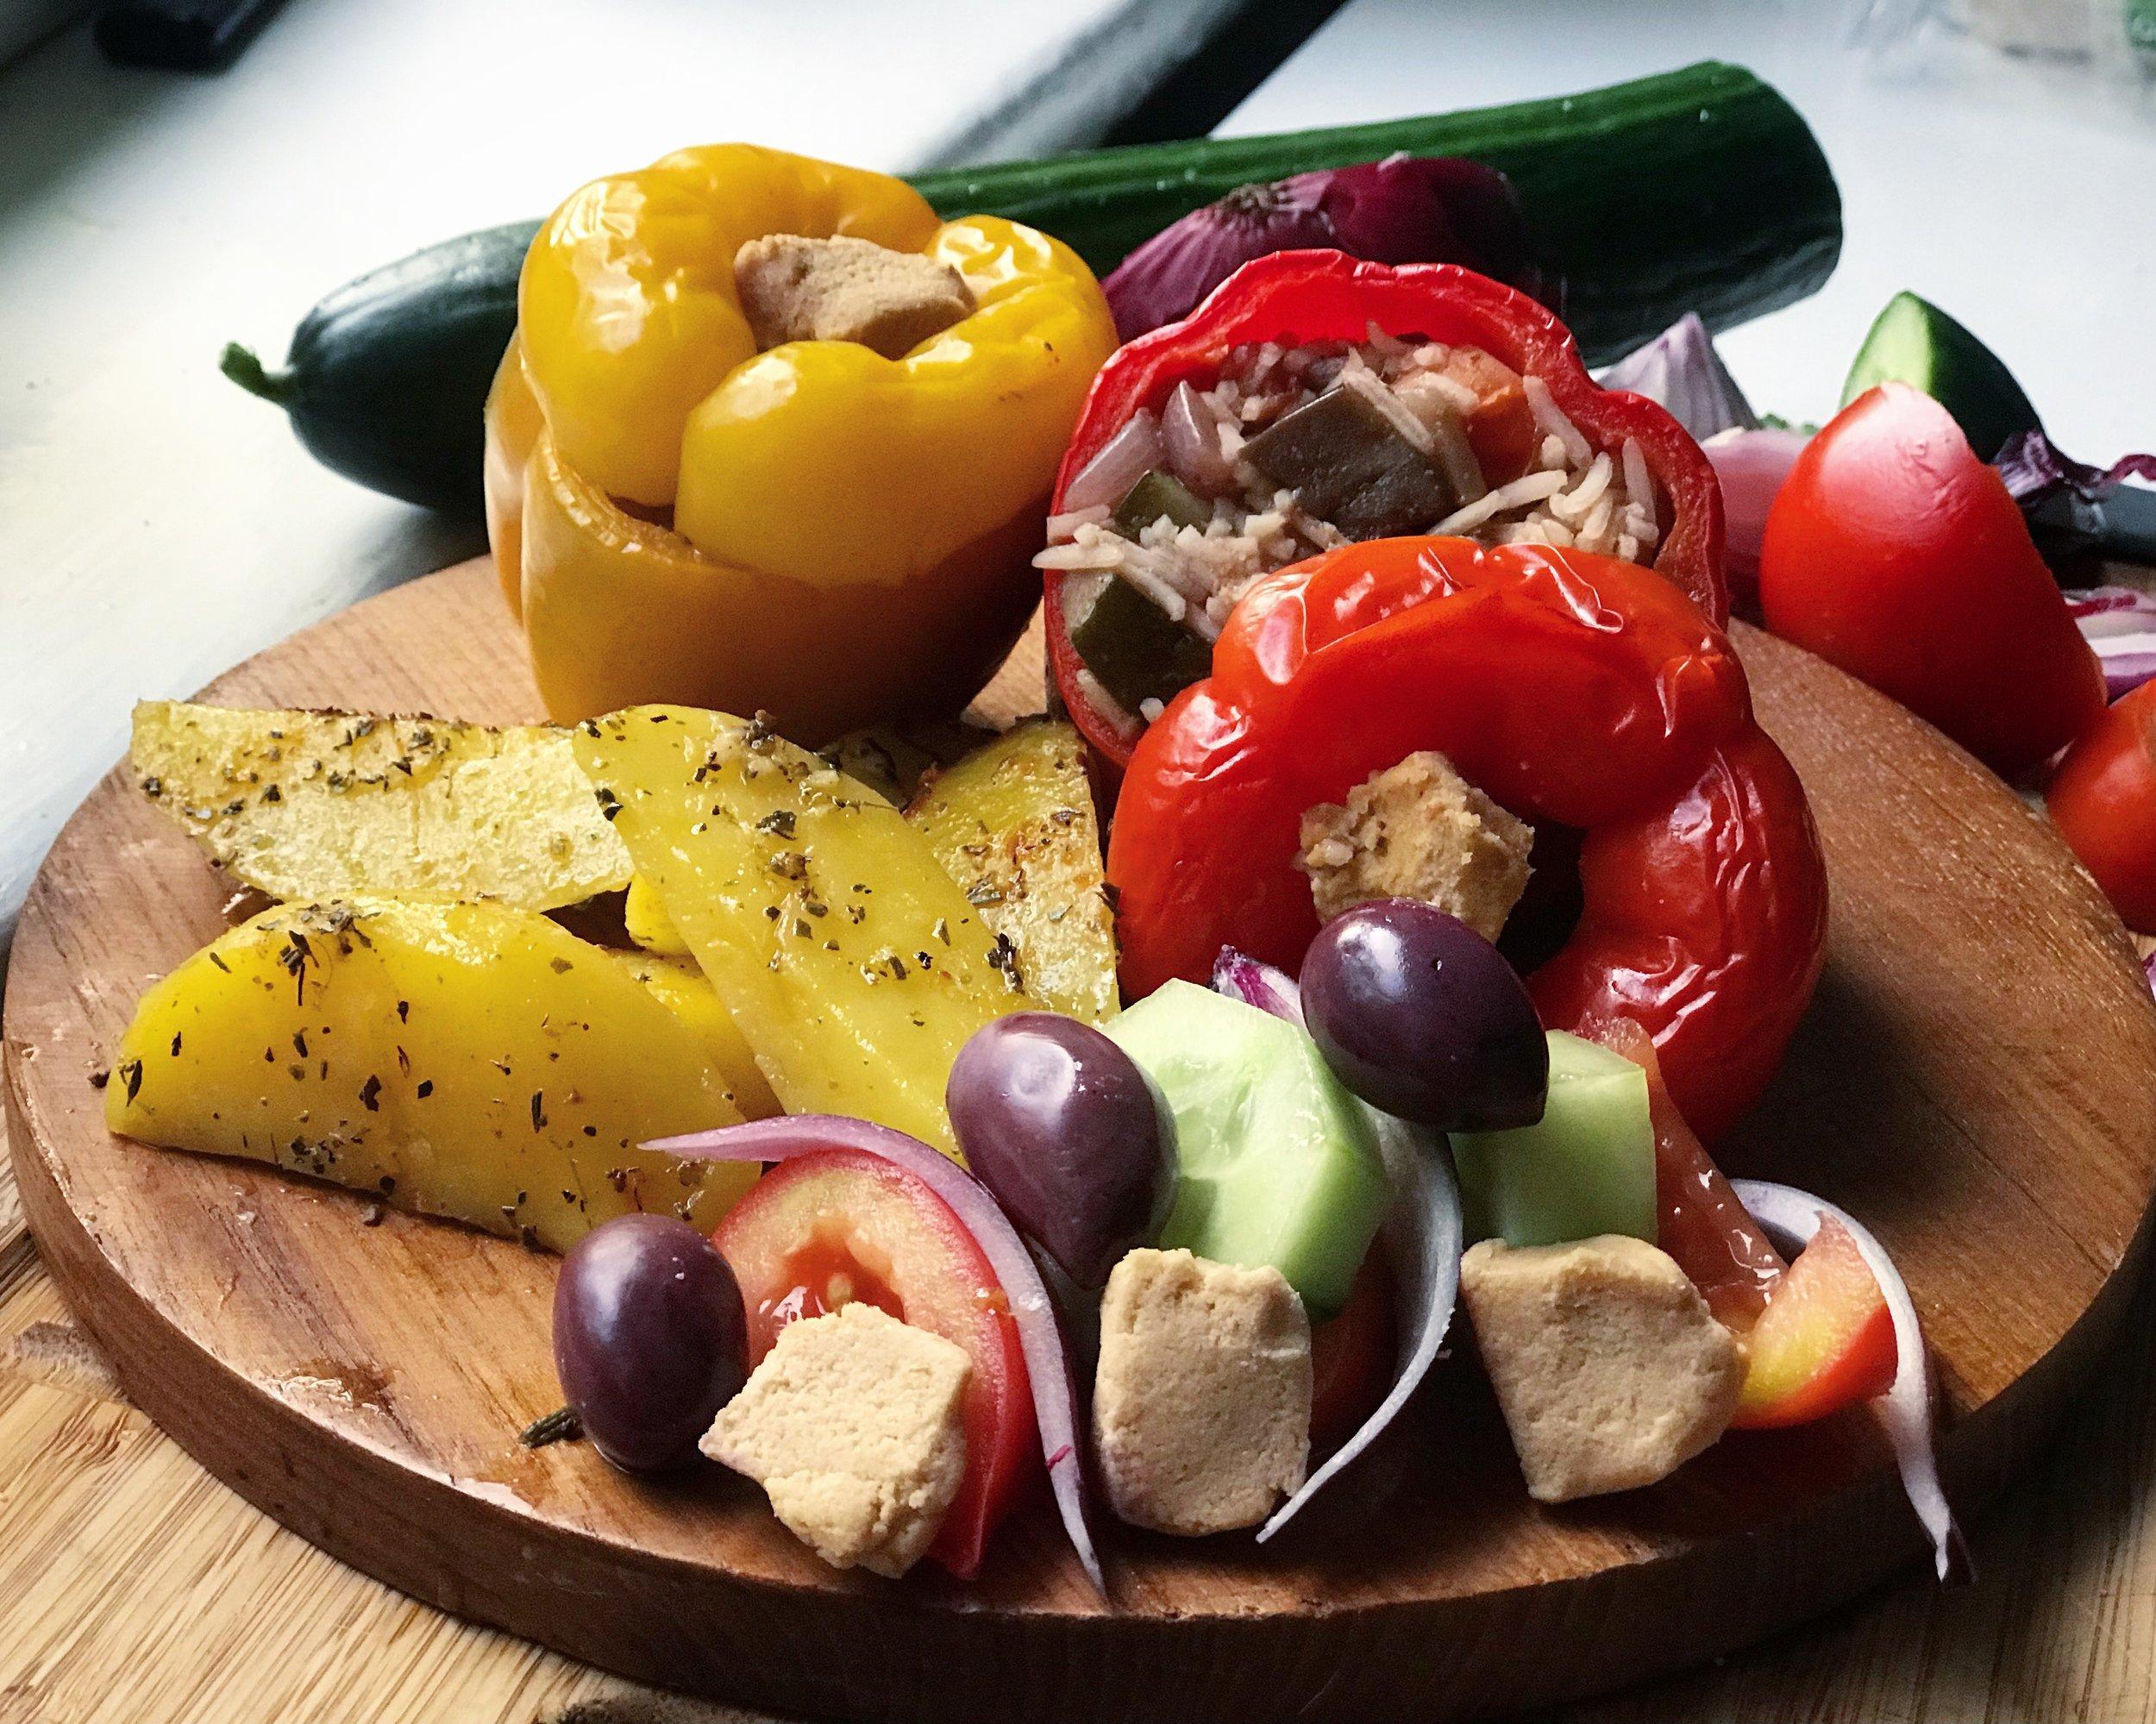 Greek Night's main meal of stuffed peppers, homemade vegan feta cheese and Greek style potatoes.